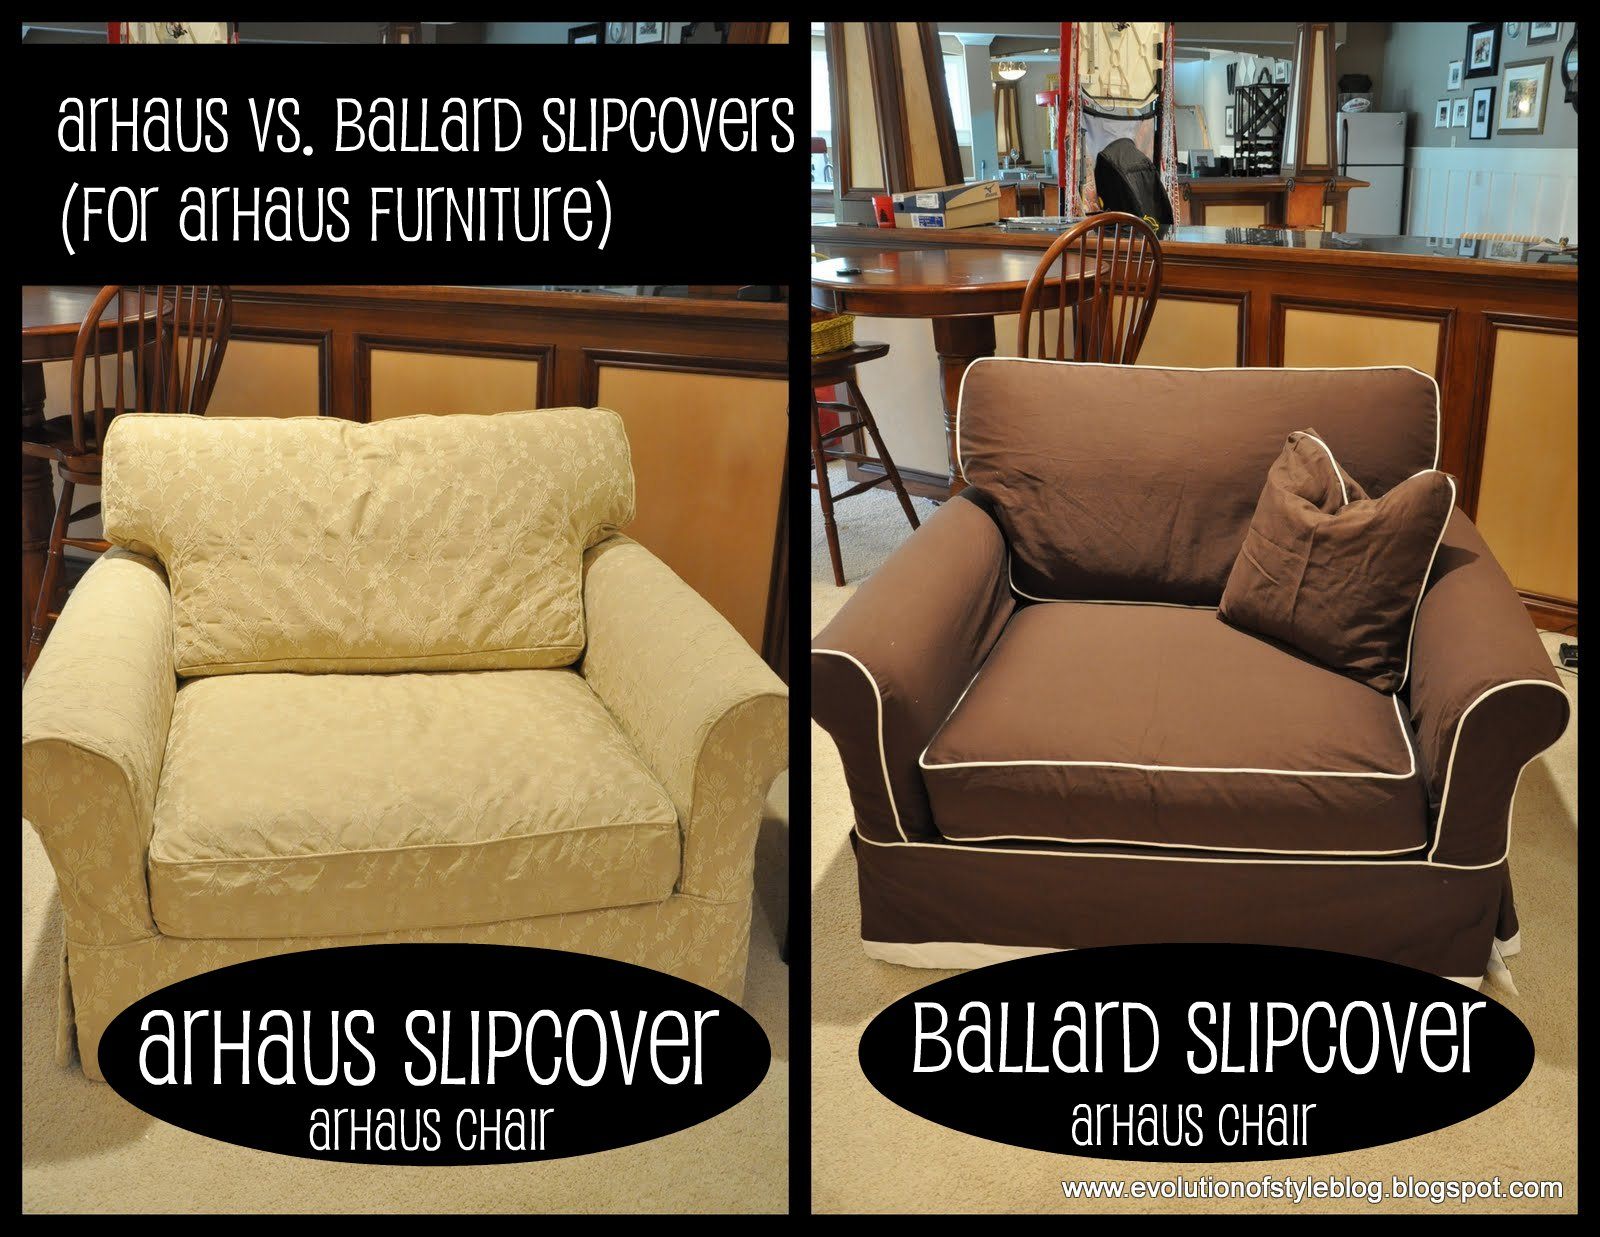 Outstanding Slipcovers Arhaus Vs Ballard Evolution Of Style Machost Co Dining Chair Design Ideas Machostcouk